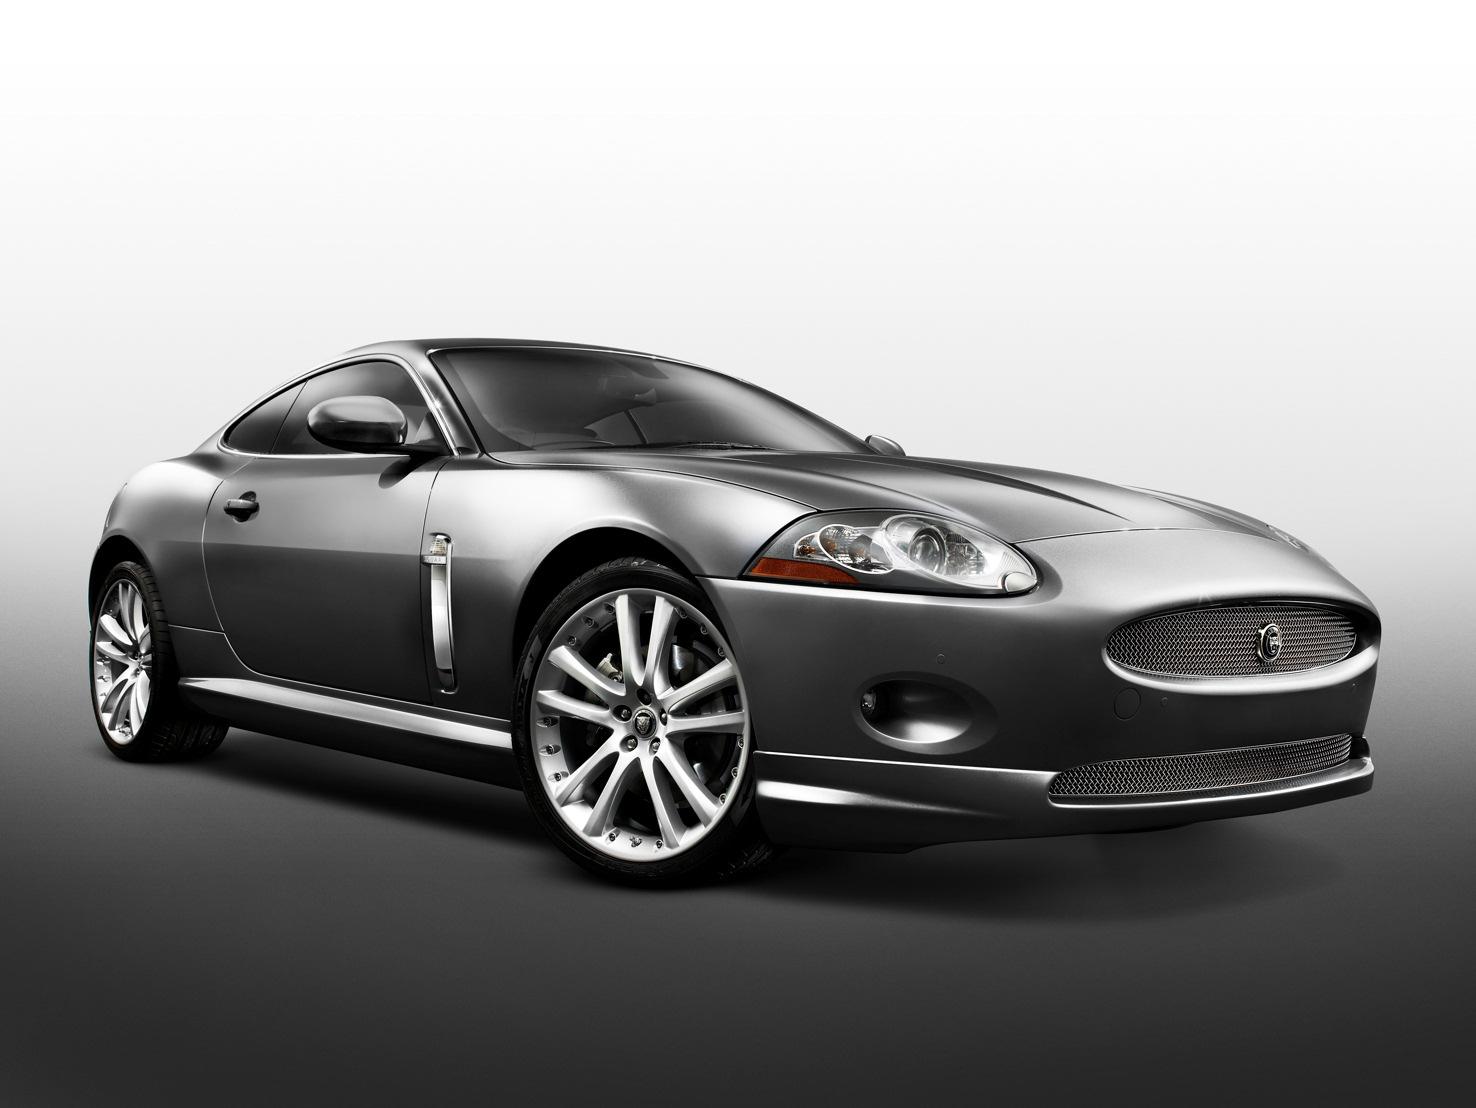 Jaguar Cars Wallpapers Popular Automotive